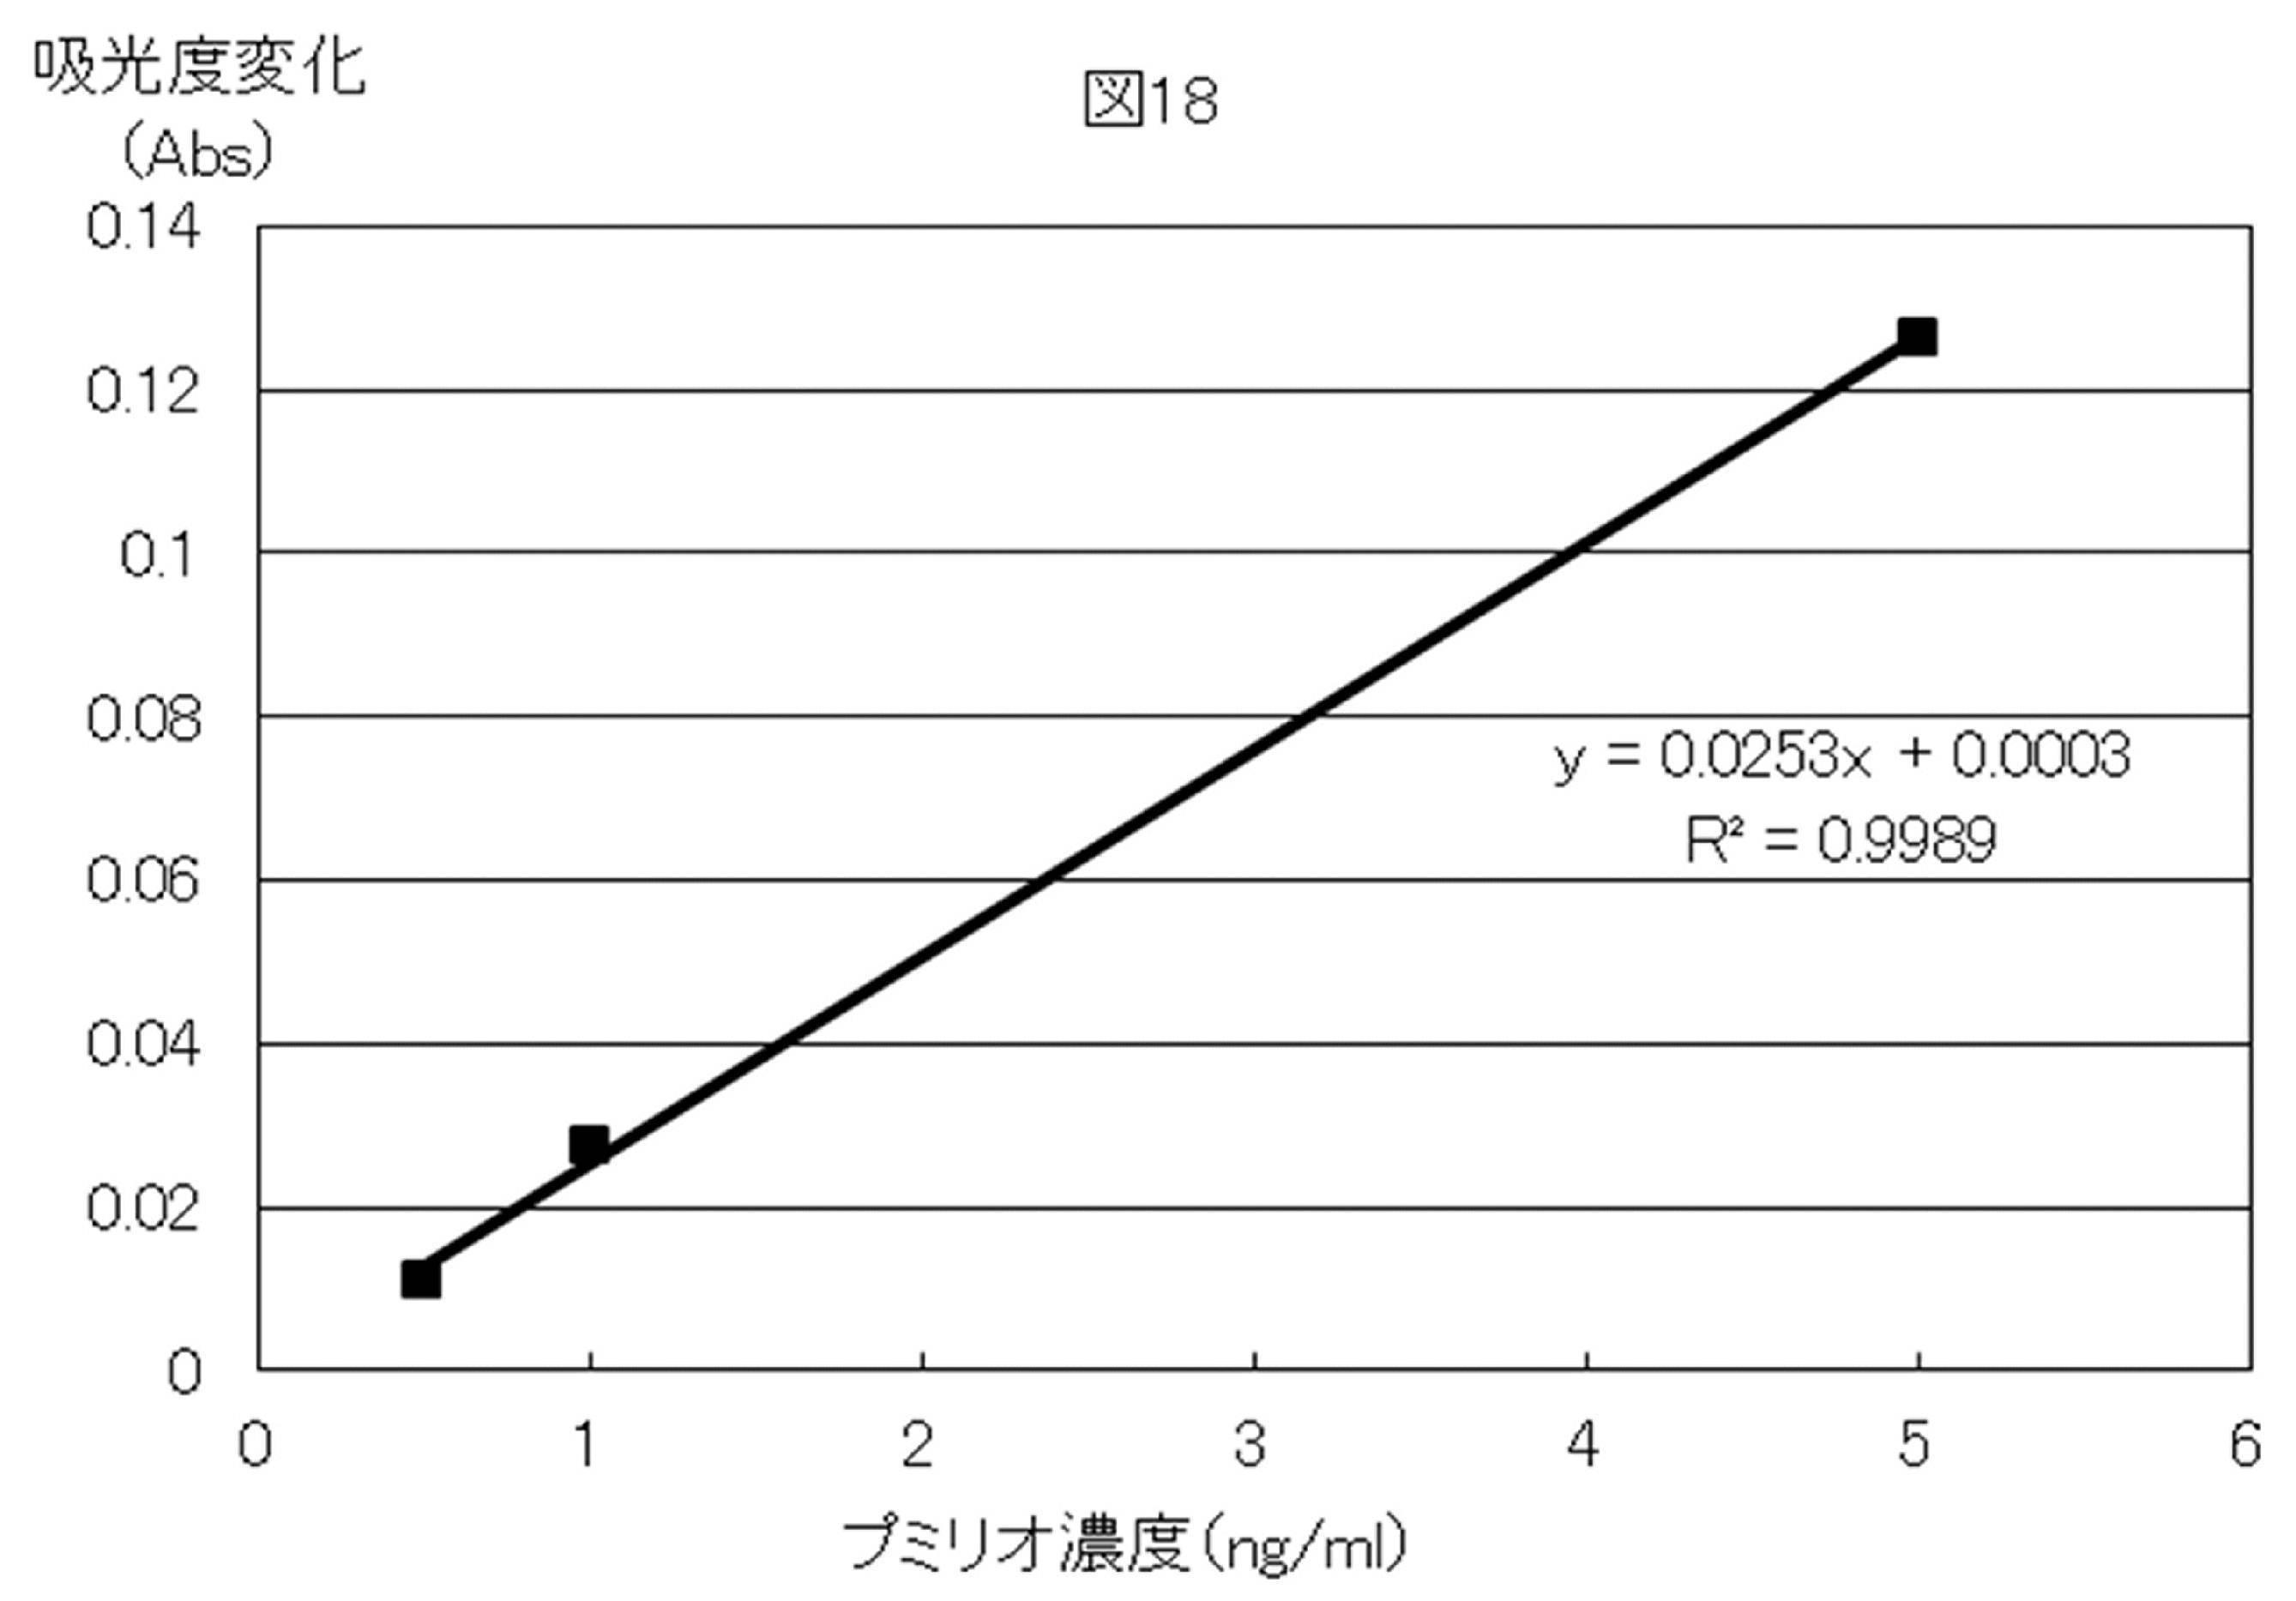 WO2012128338A1 - タンパク質および核酸の超高感度測定法およびキット、並びに新規な酵素基質         - Google PatentsFamily